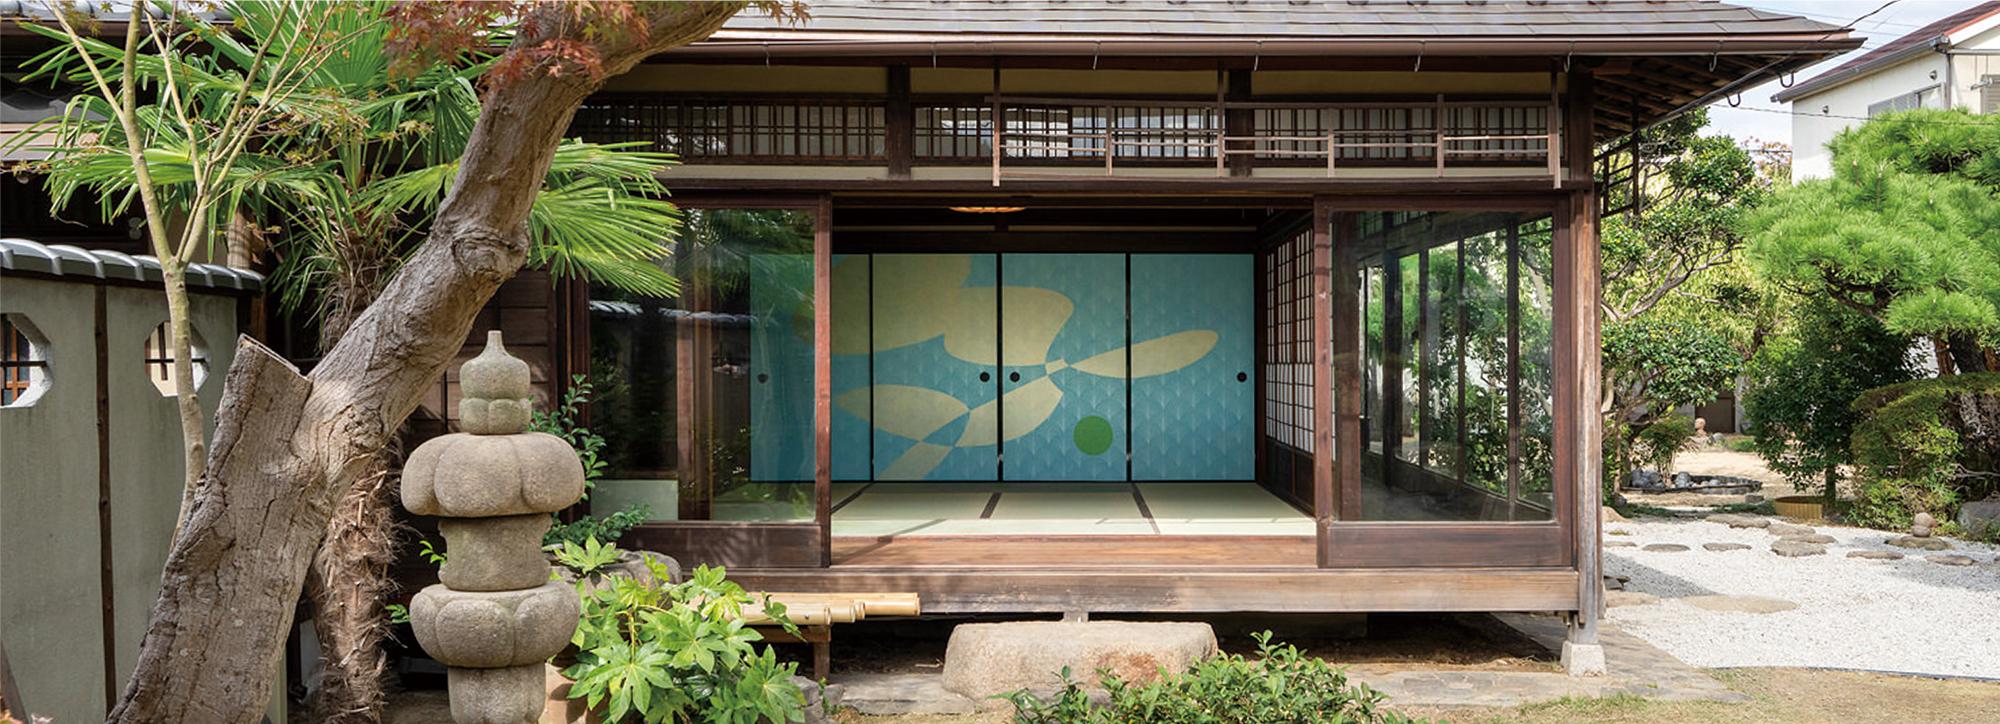 SAKAINOMA HOTEL 濵 image